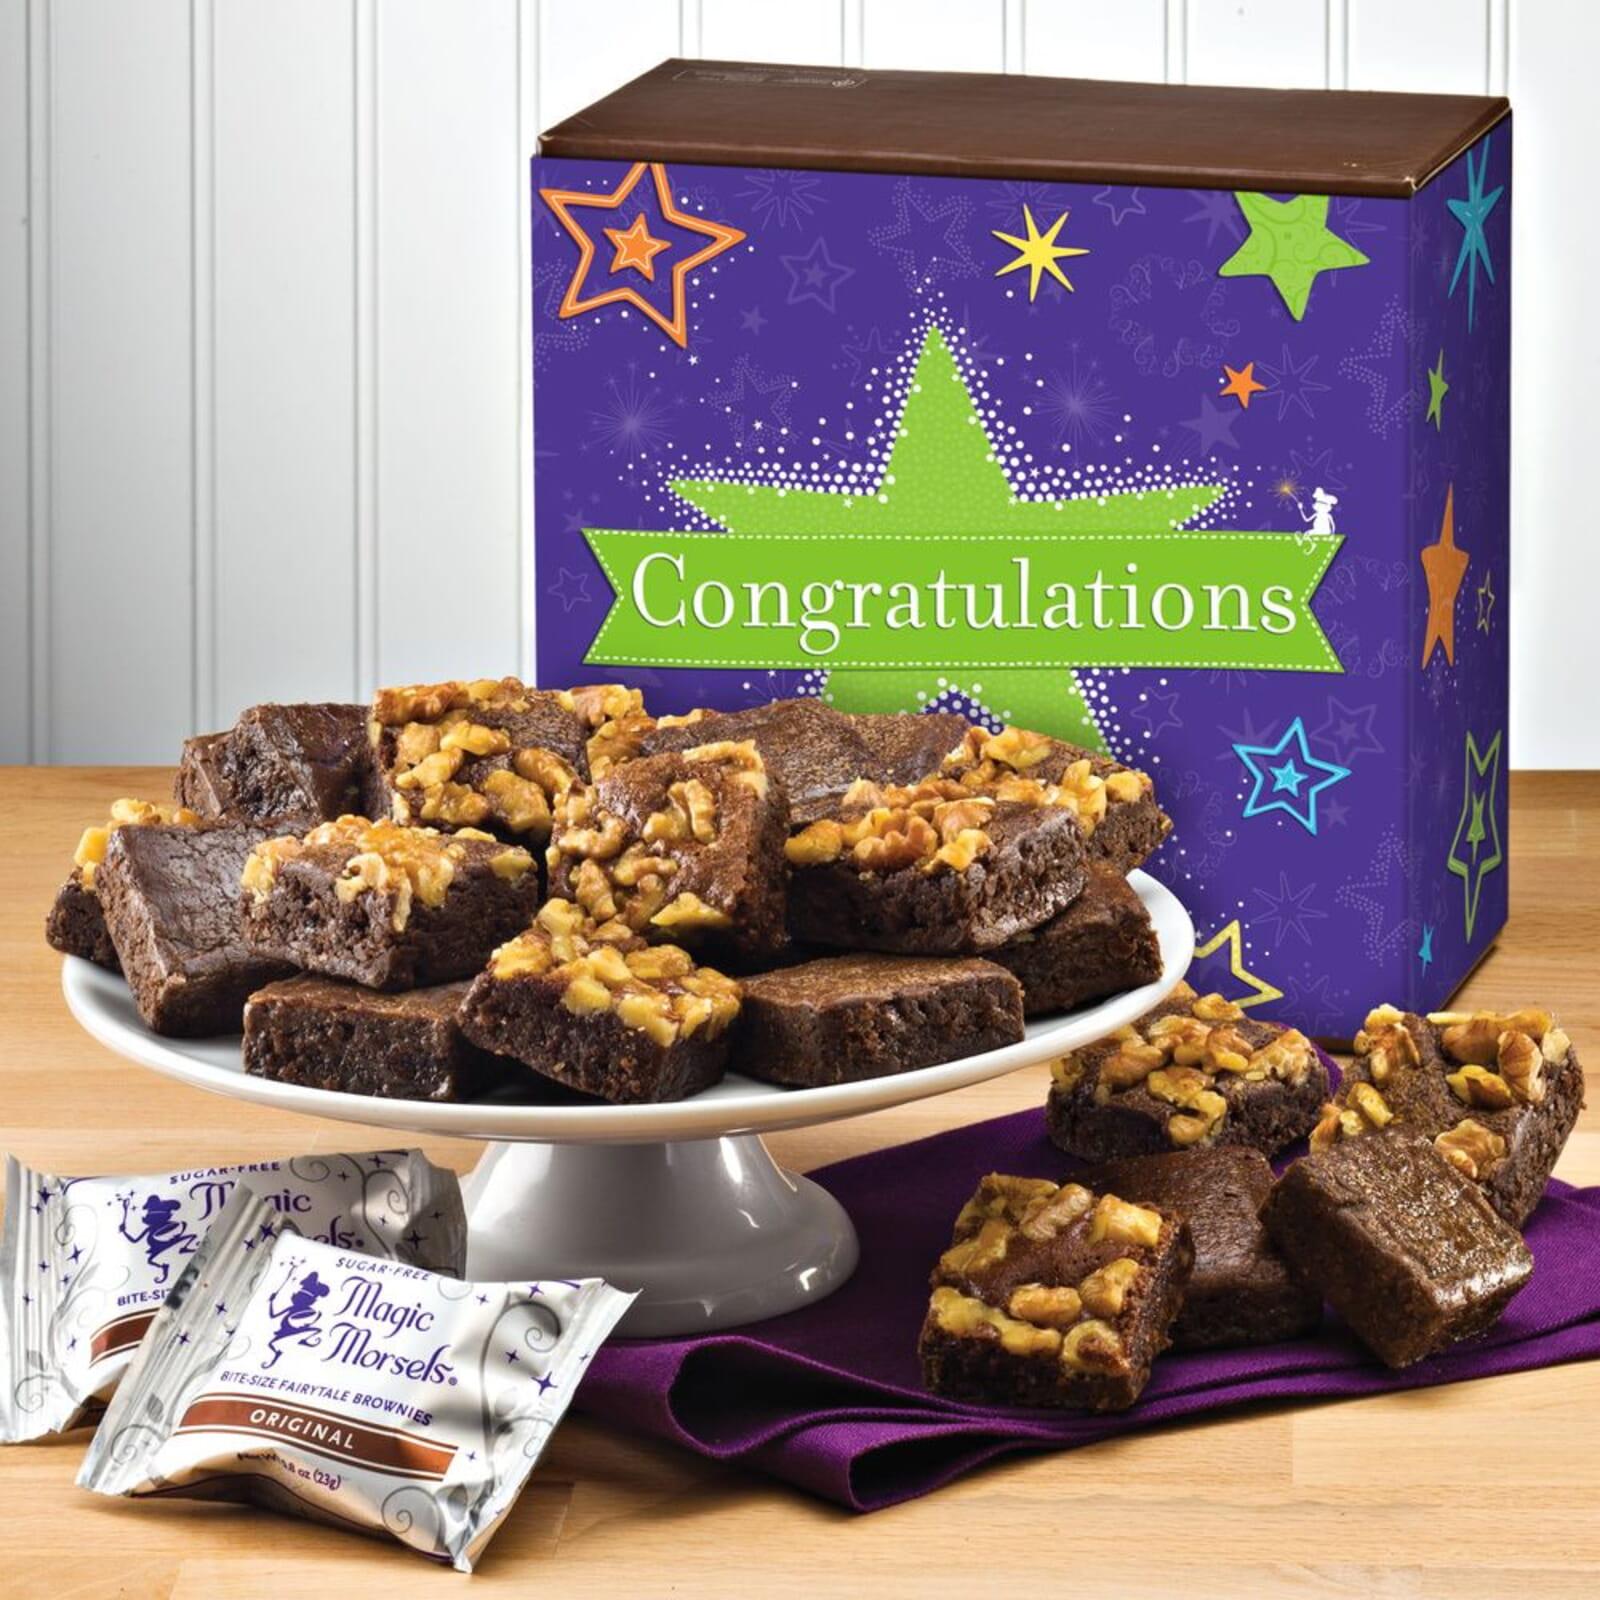 Congratulations Sugar-Free Morsel 48